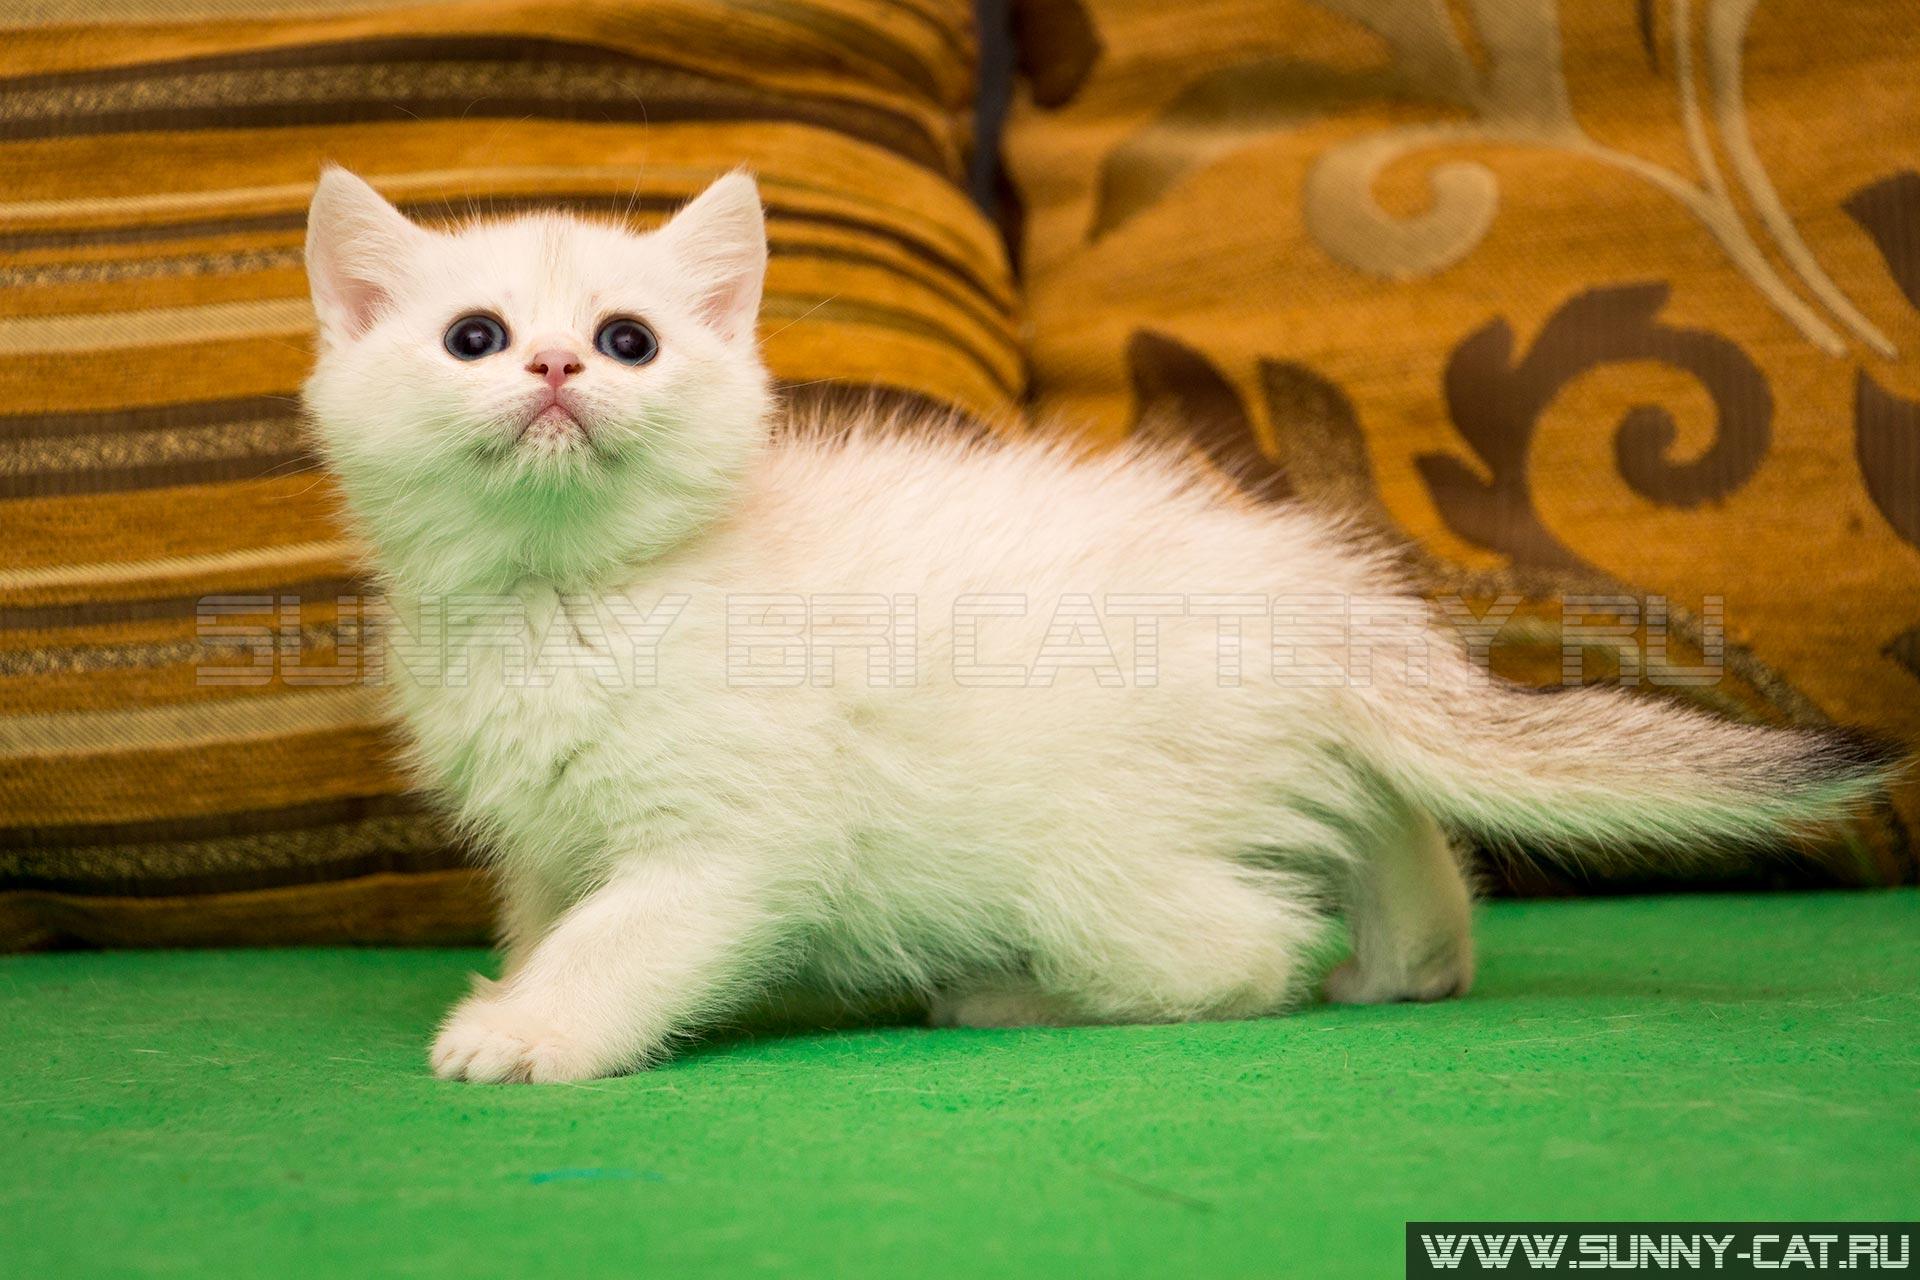 Клуб британских кошек валенсия путилин